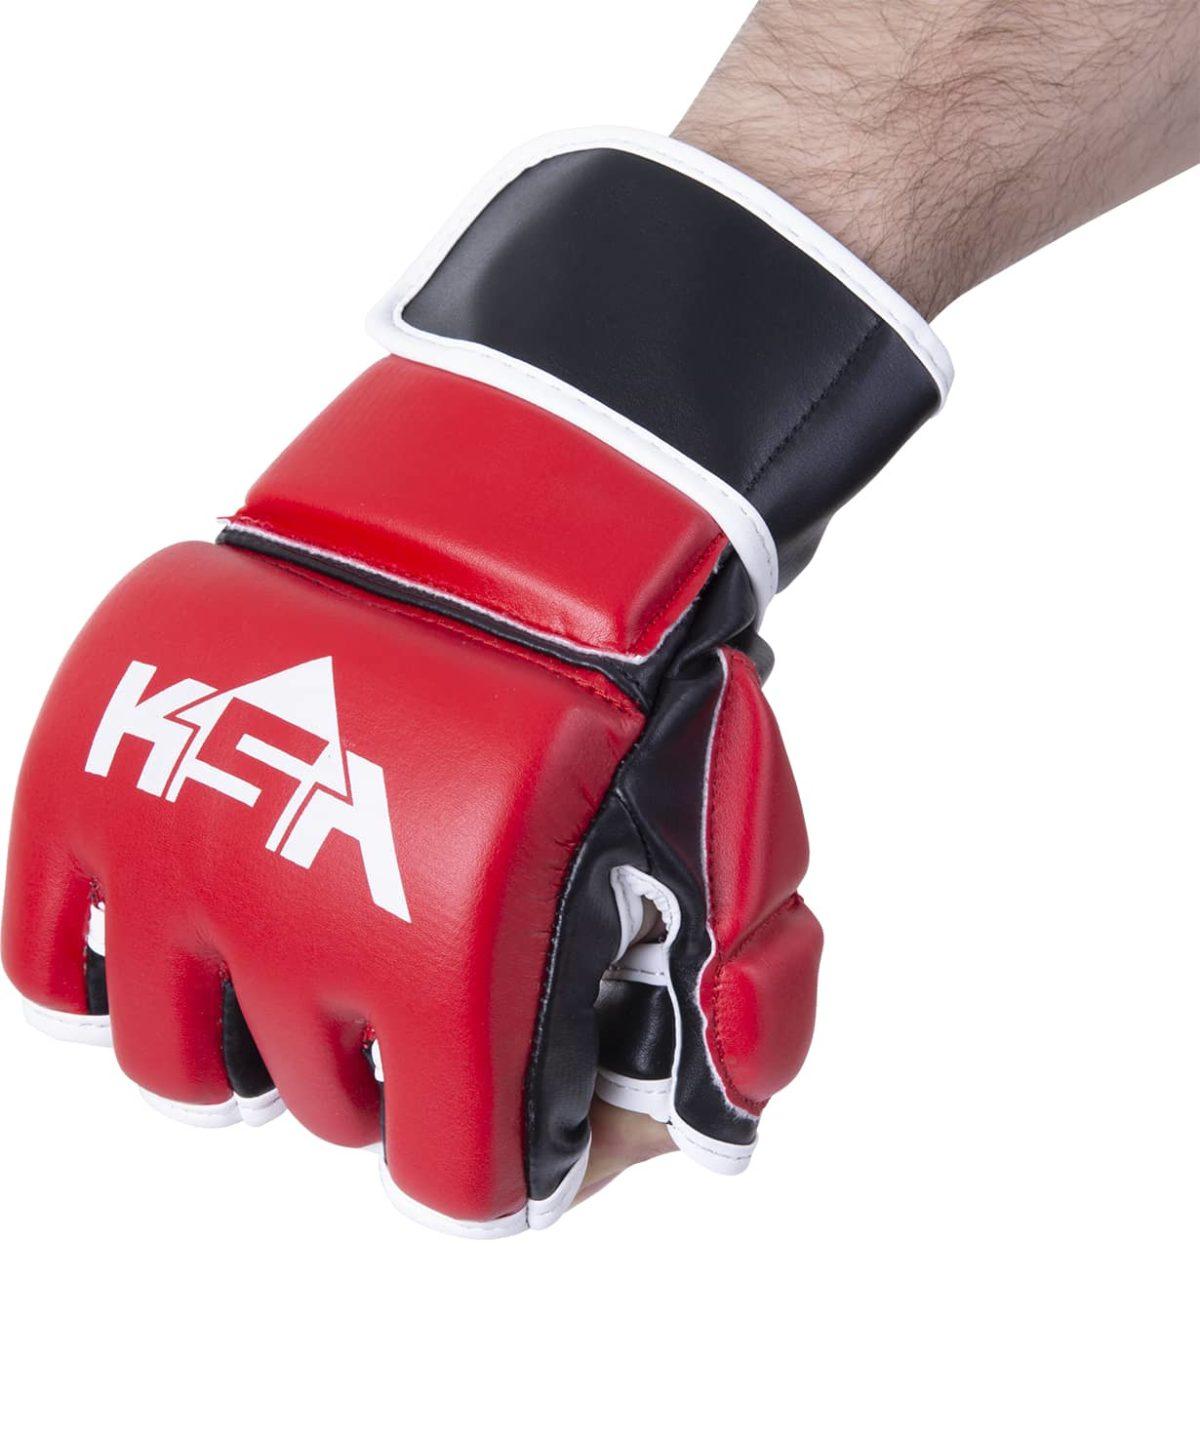 KSA Перчатки для ММА Wasp Red, к/з 7852 - 2